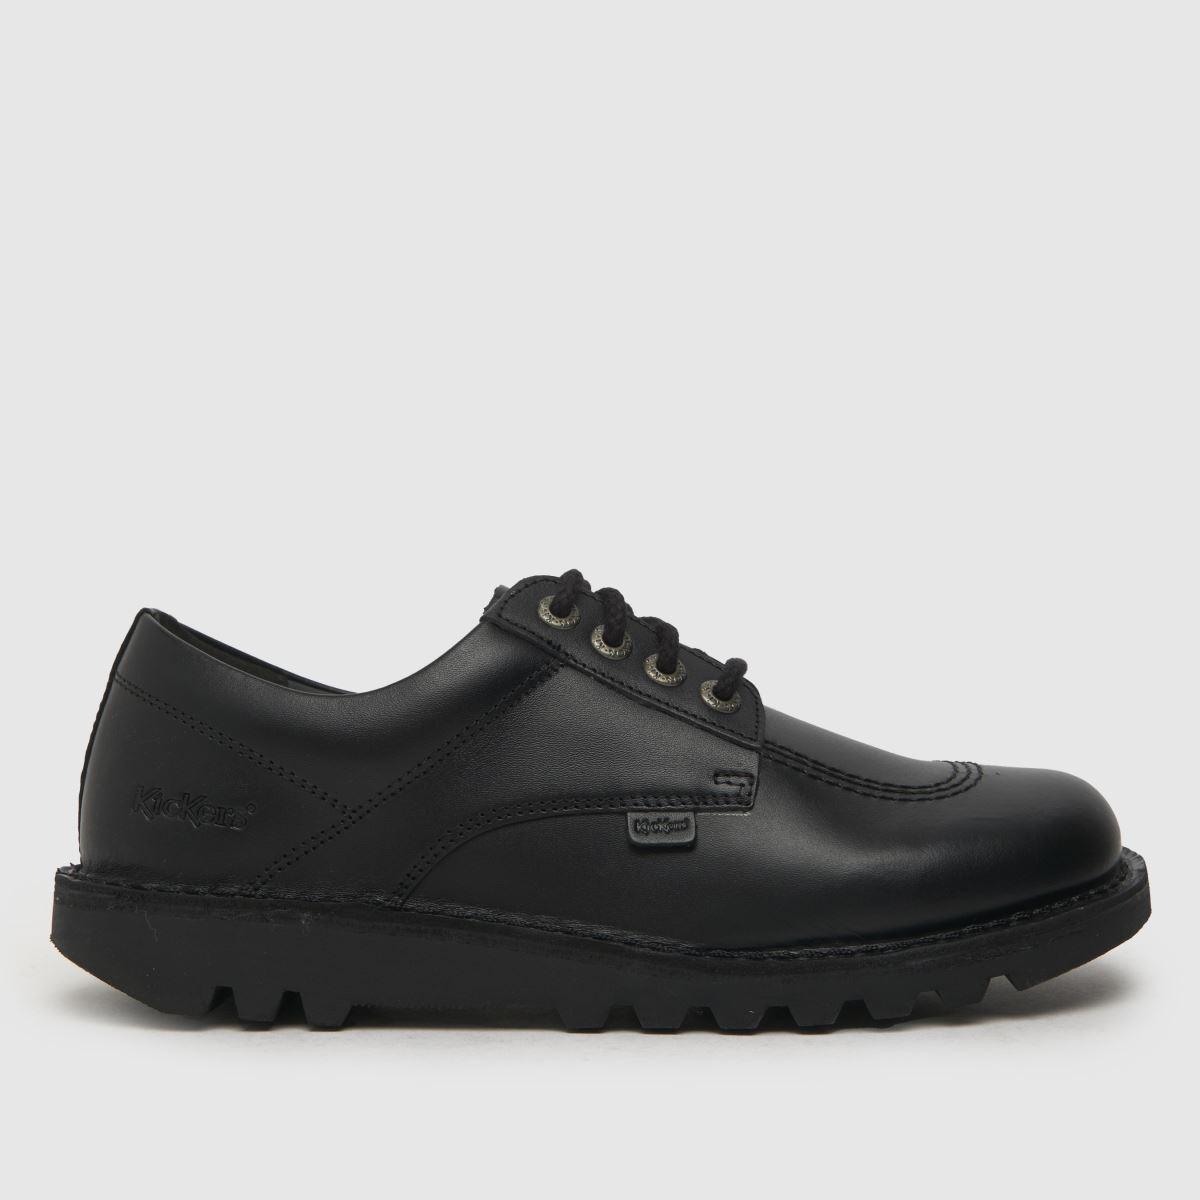 Kickers Kickers Black Kick Lo Flat Shoes